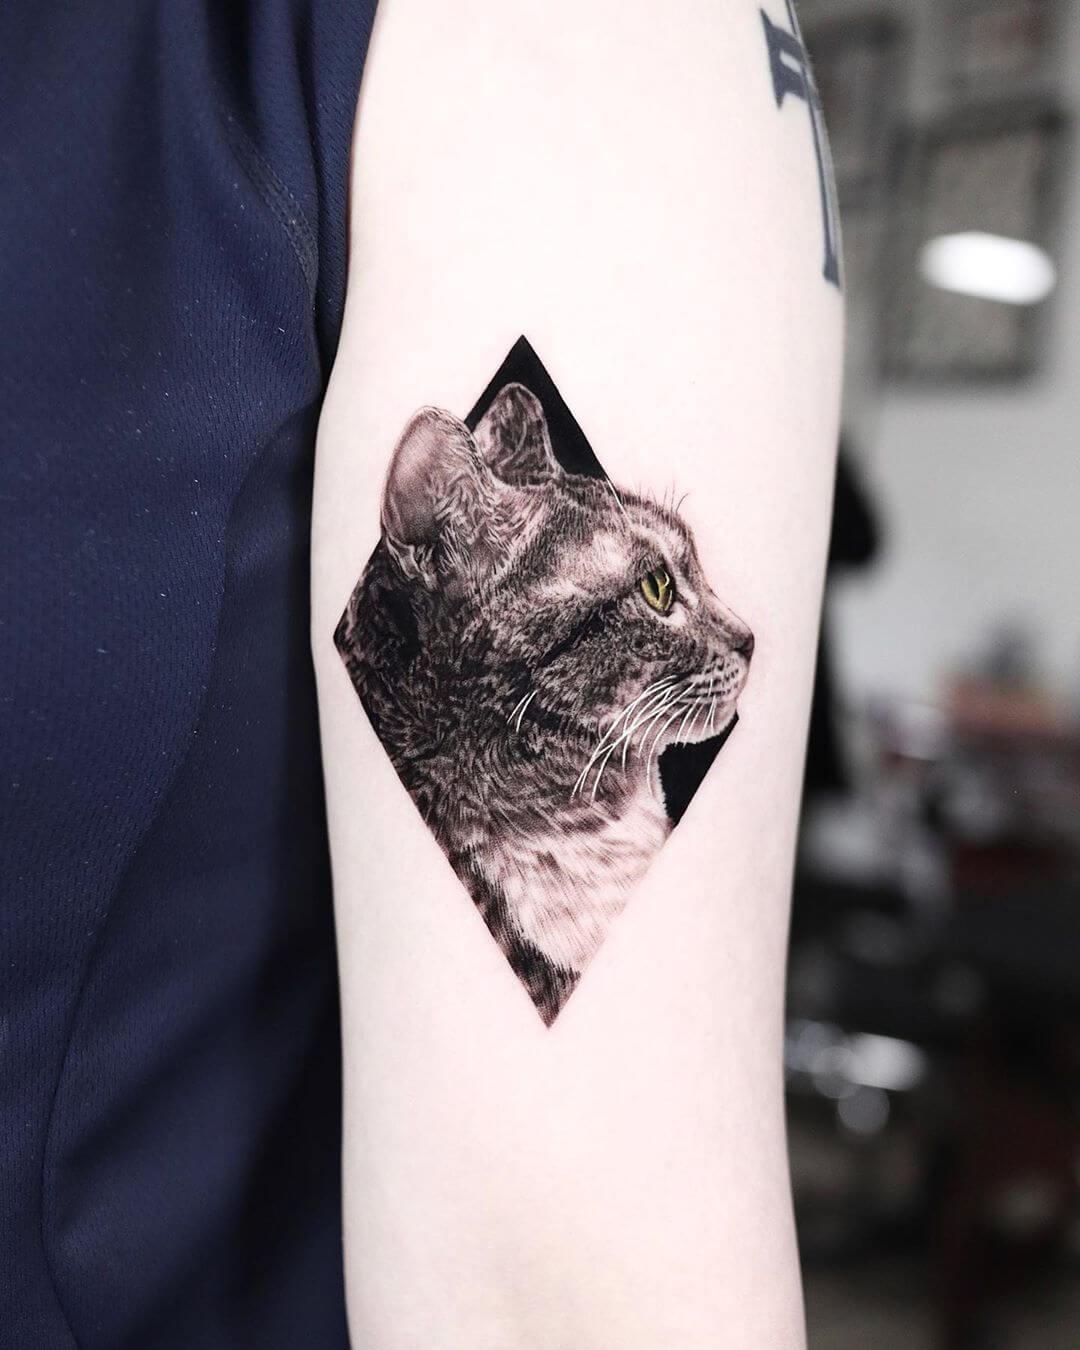 Cat side portrait tattoo by Yeono